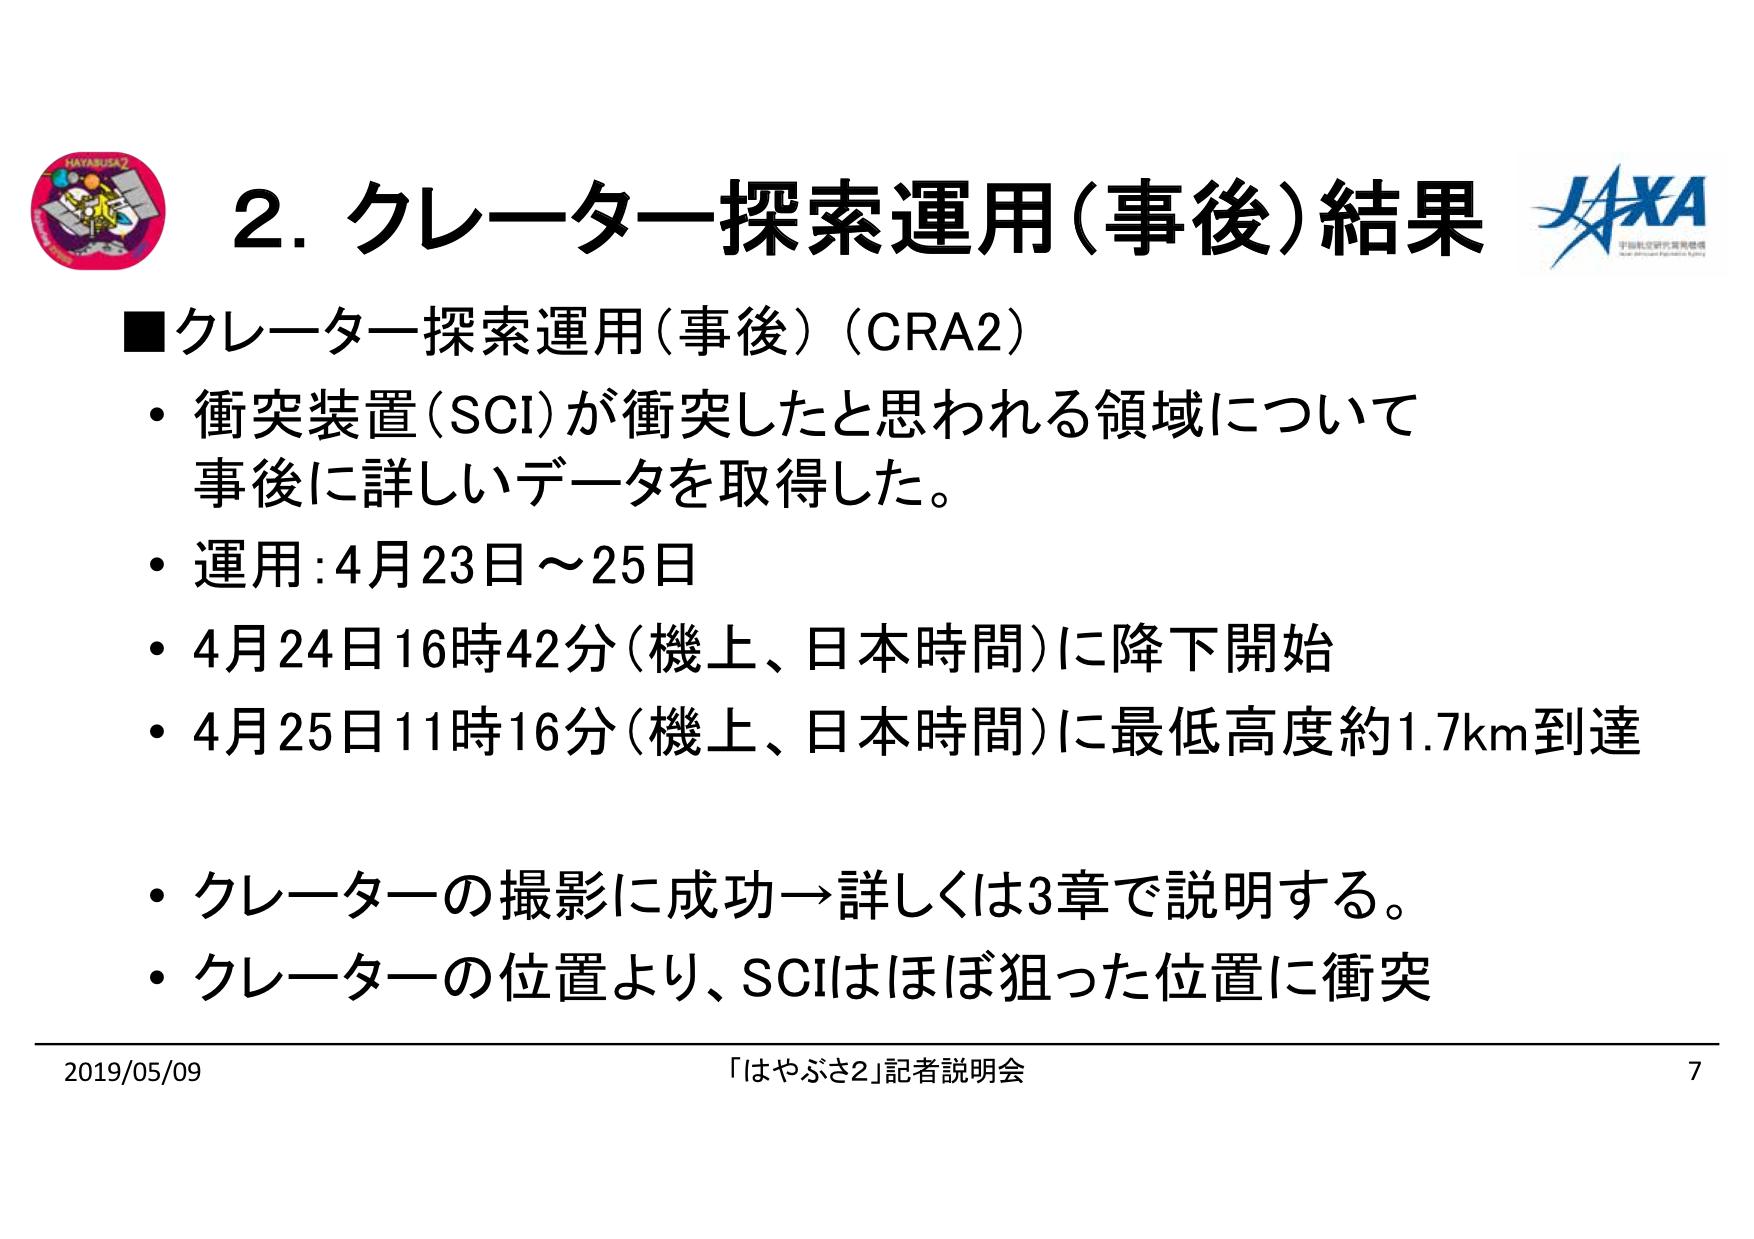 f:id:Imamura:20190509154403p:plain